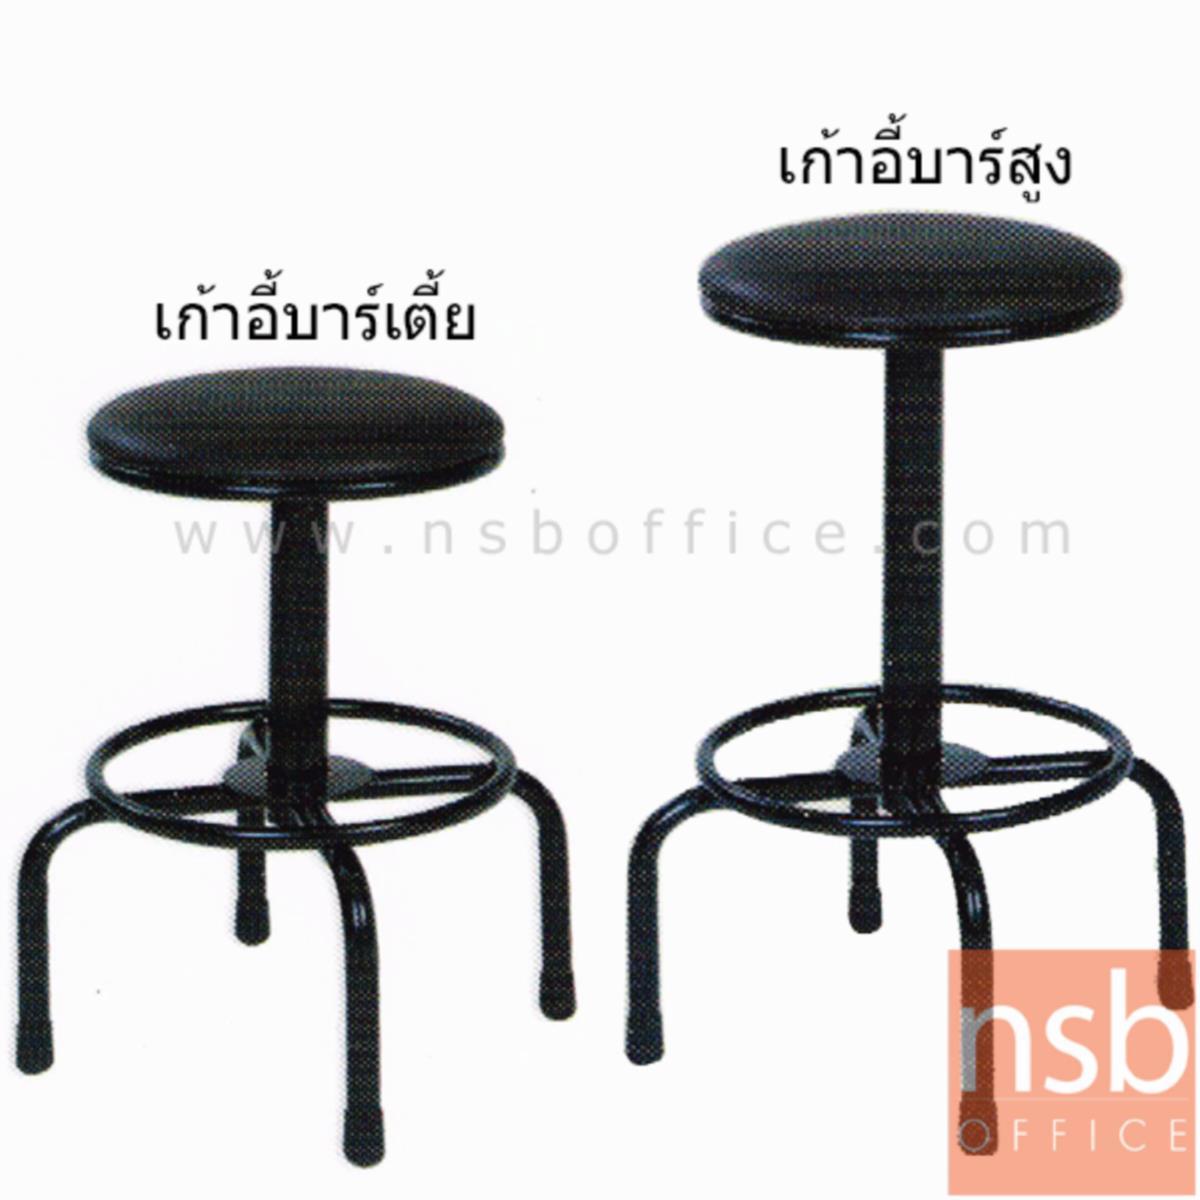 B14A124:เก้าอี้บาร์สตูลที่นั่งเบาะ รุ่น Ancel (แอนเซล)  ขาเหล็กพ่นดำ